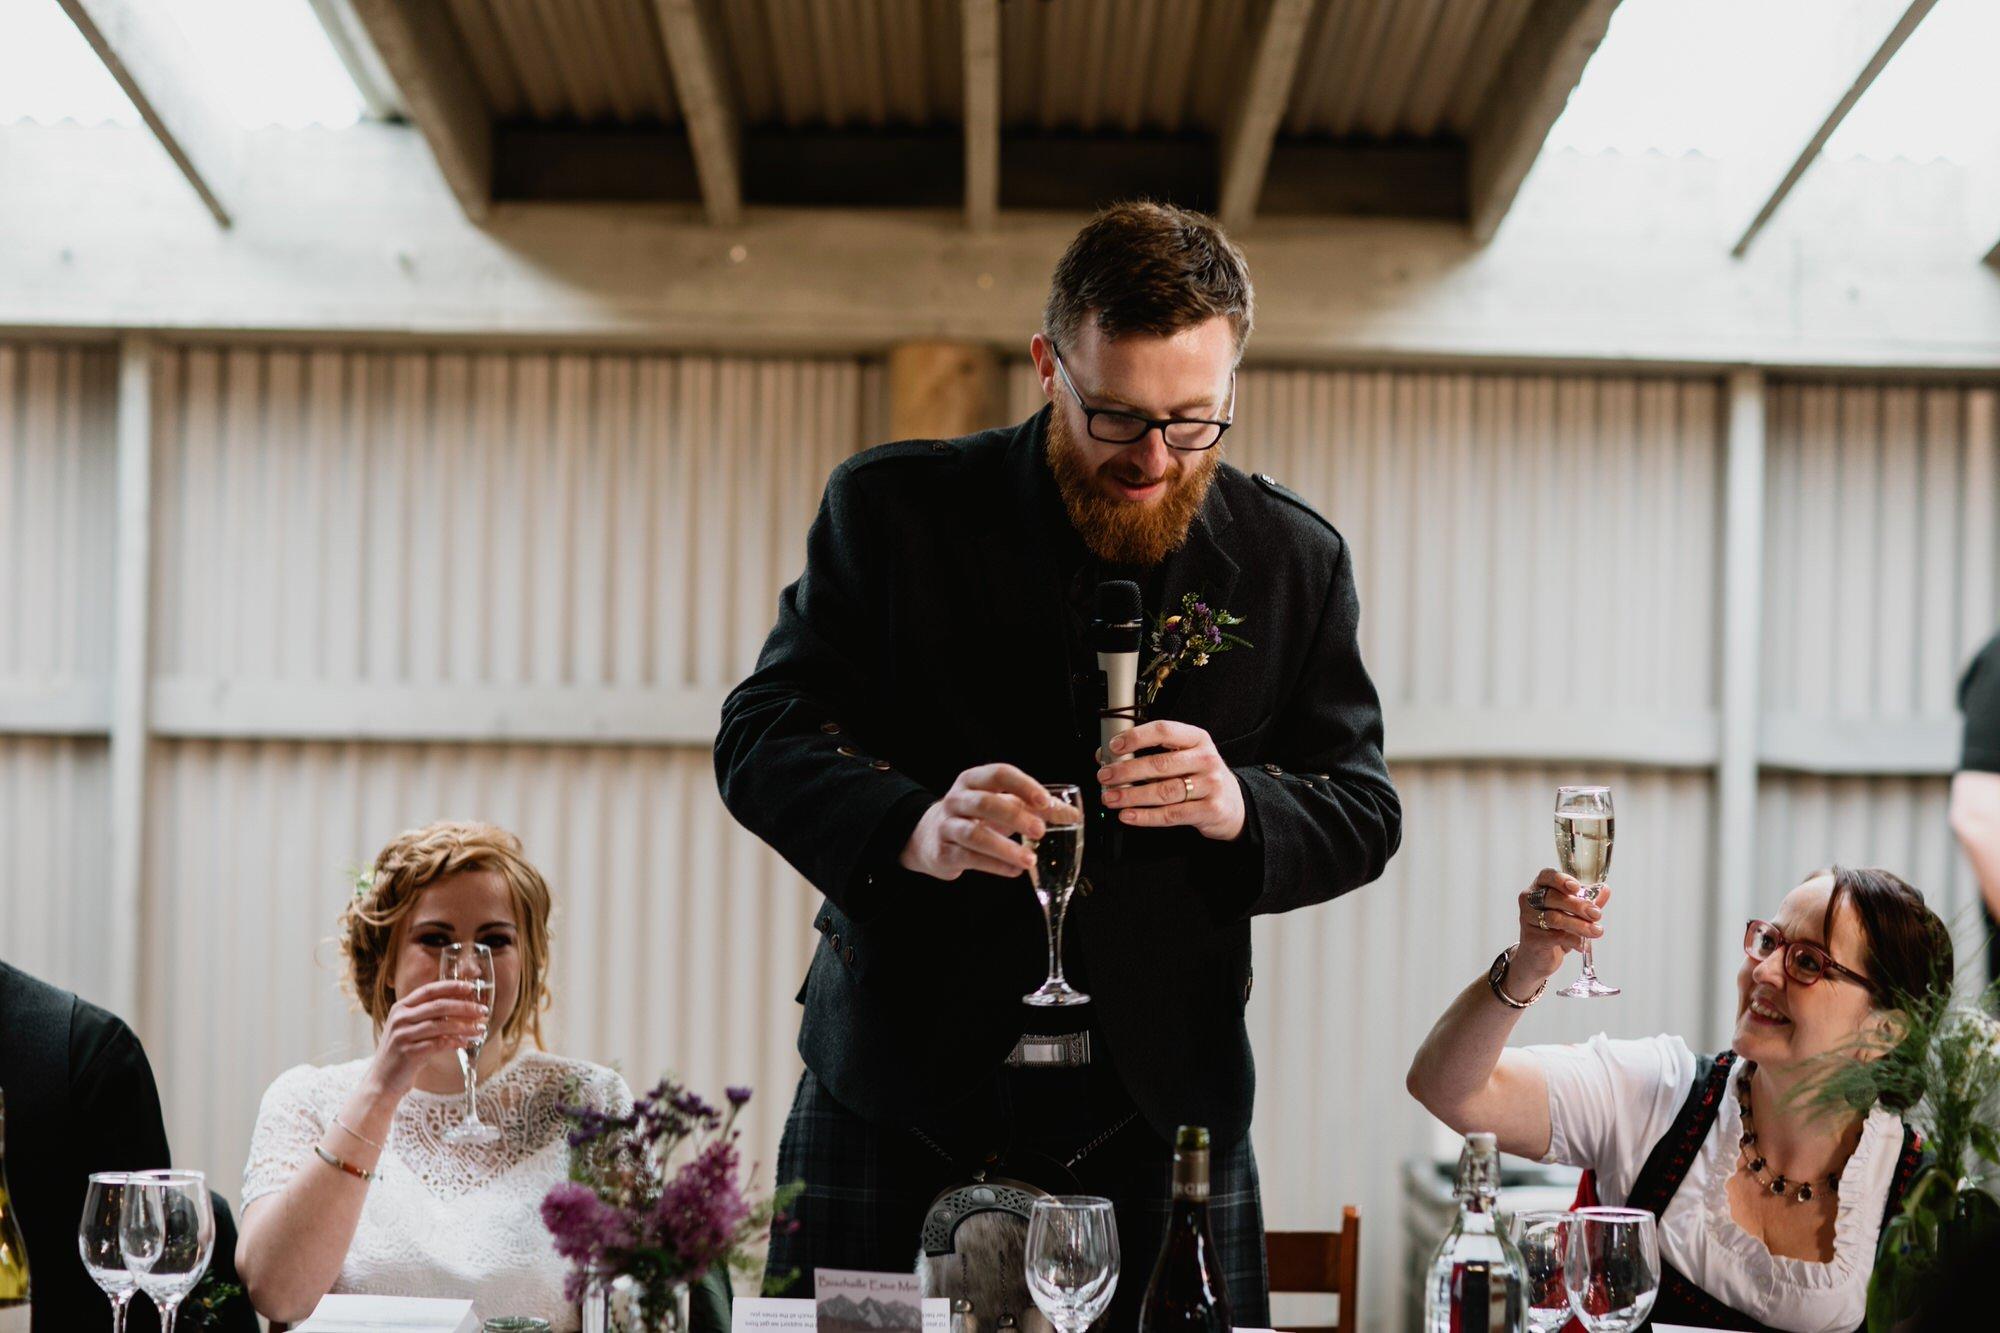 043 TIN SHED KNOCKRAICH WEDDING AUSTRIAN SCOTTISH ZOE ALEXANDRA PHOTOGRAPHY